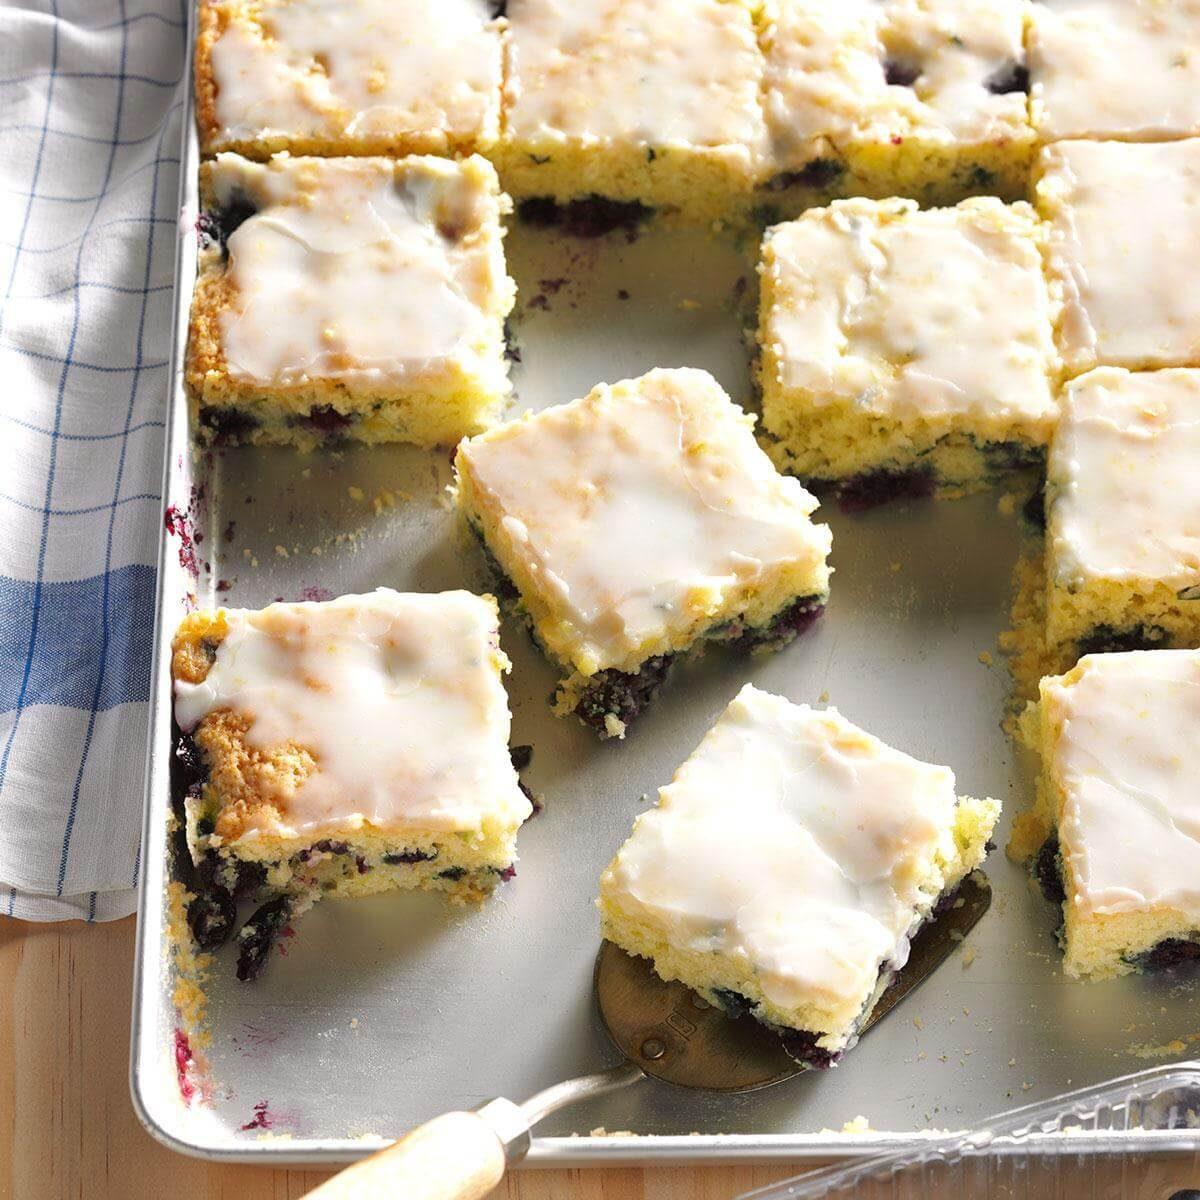 70 Fantastic Blueberry Dessert Recipes